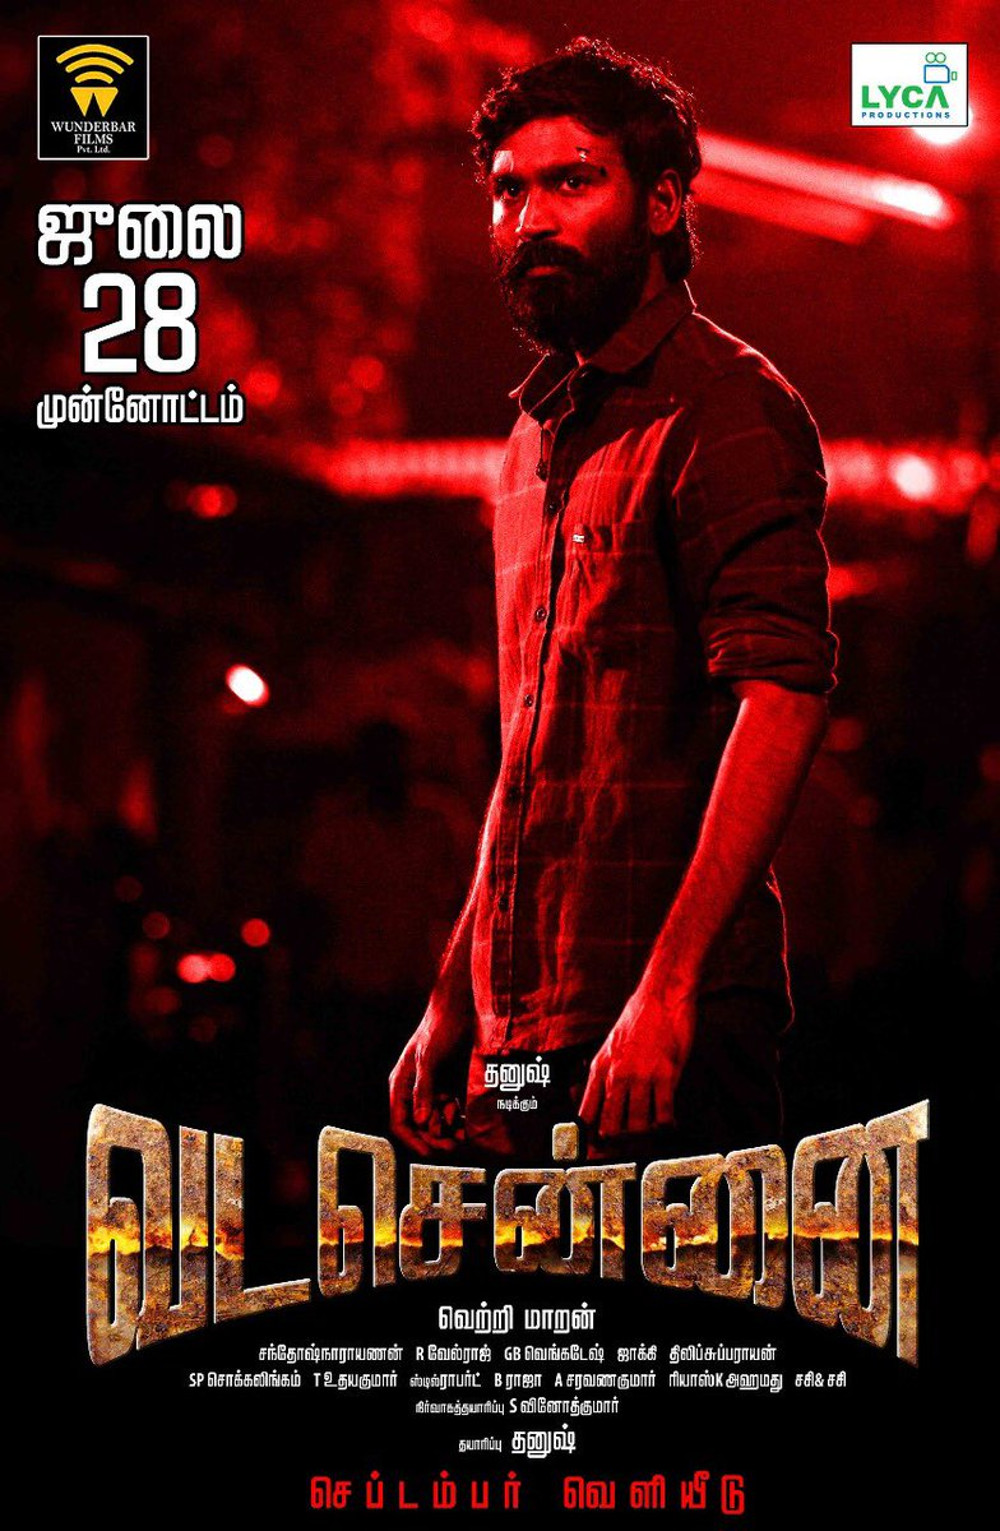 Dhanush-Vetrimaaran Vada Chennai Movie Trailer release on 28 July